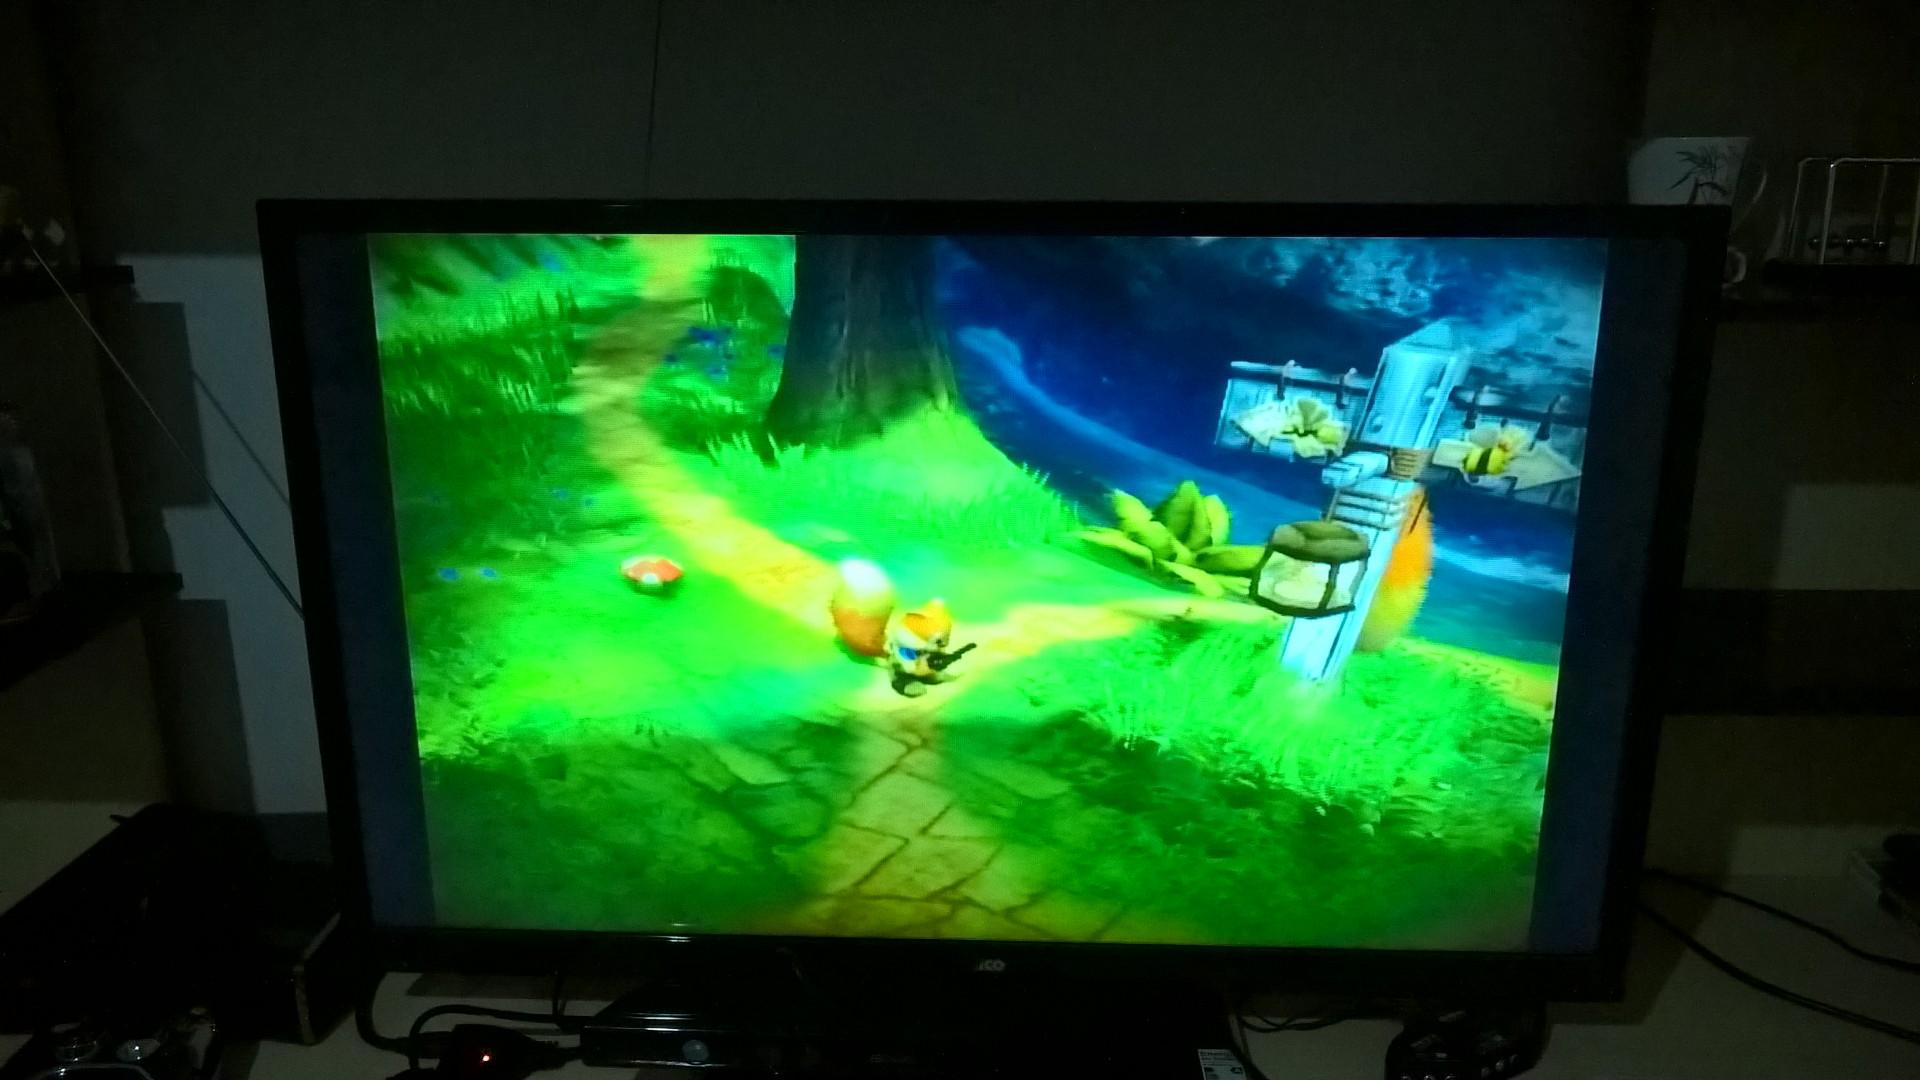 Jogo utilizando HDMI